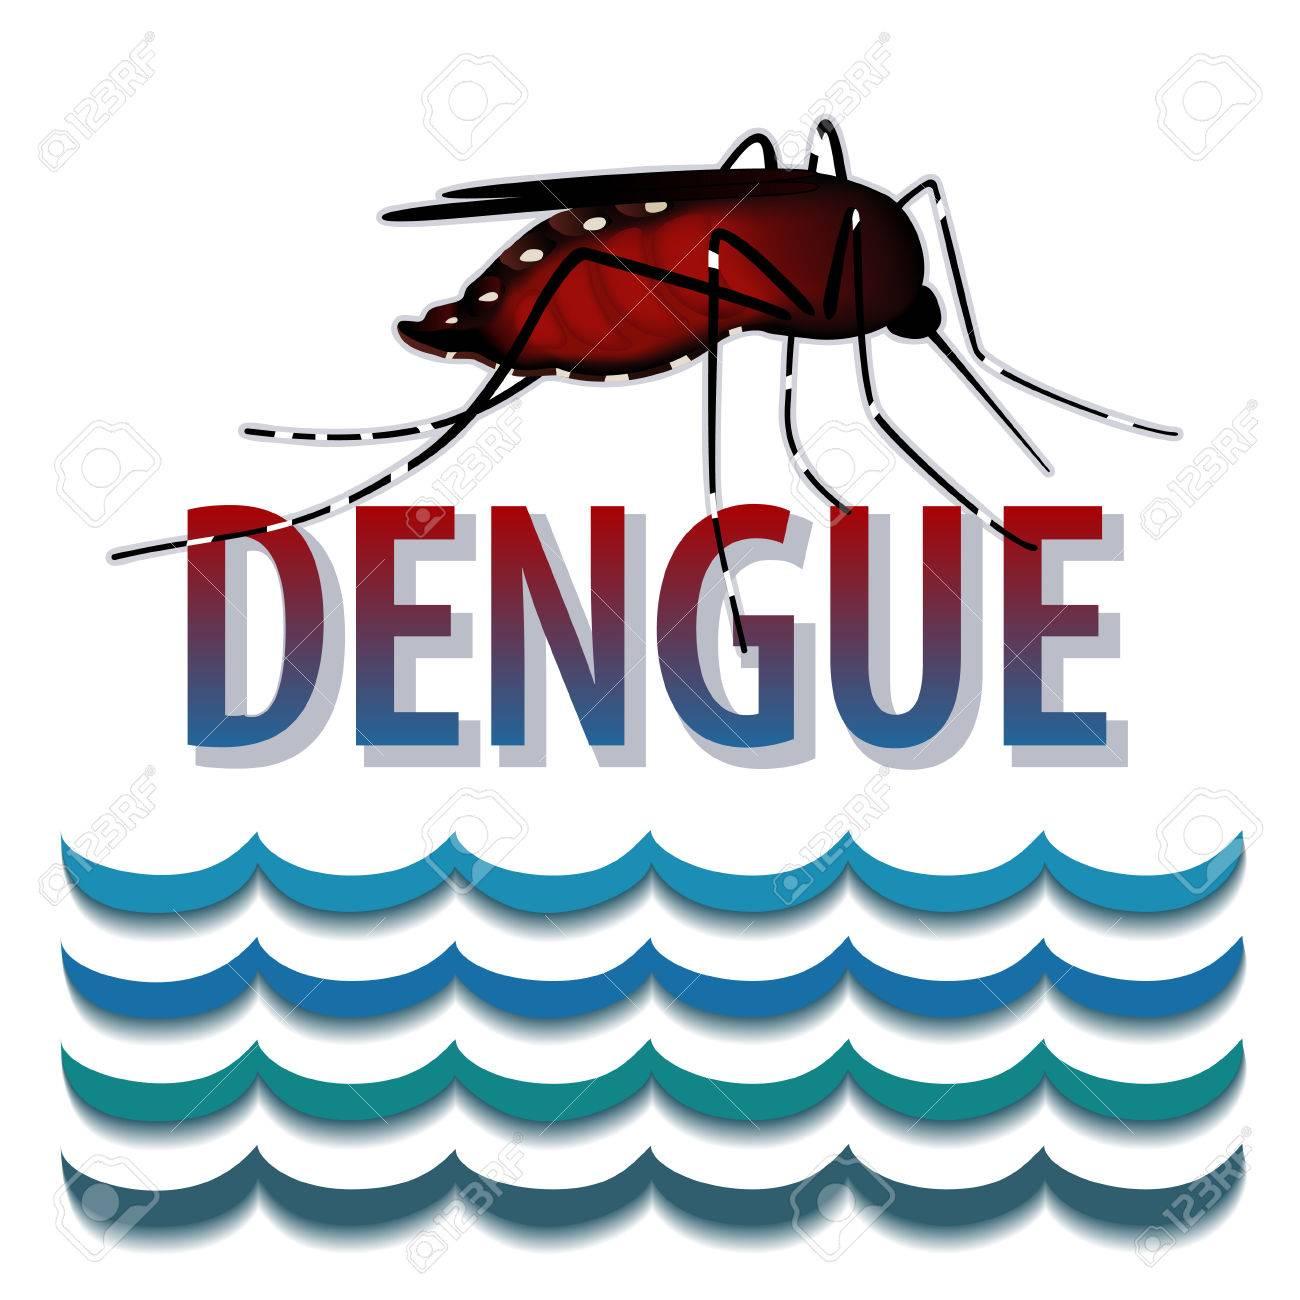 Dengue Fever Infects La Fte De >> Dengue Fever Mosquito Infectious Virus Disease Standing Water